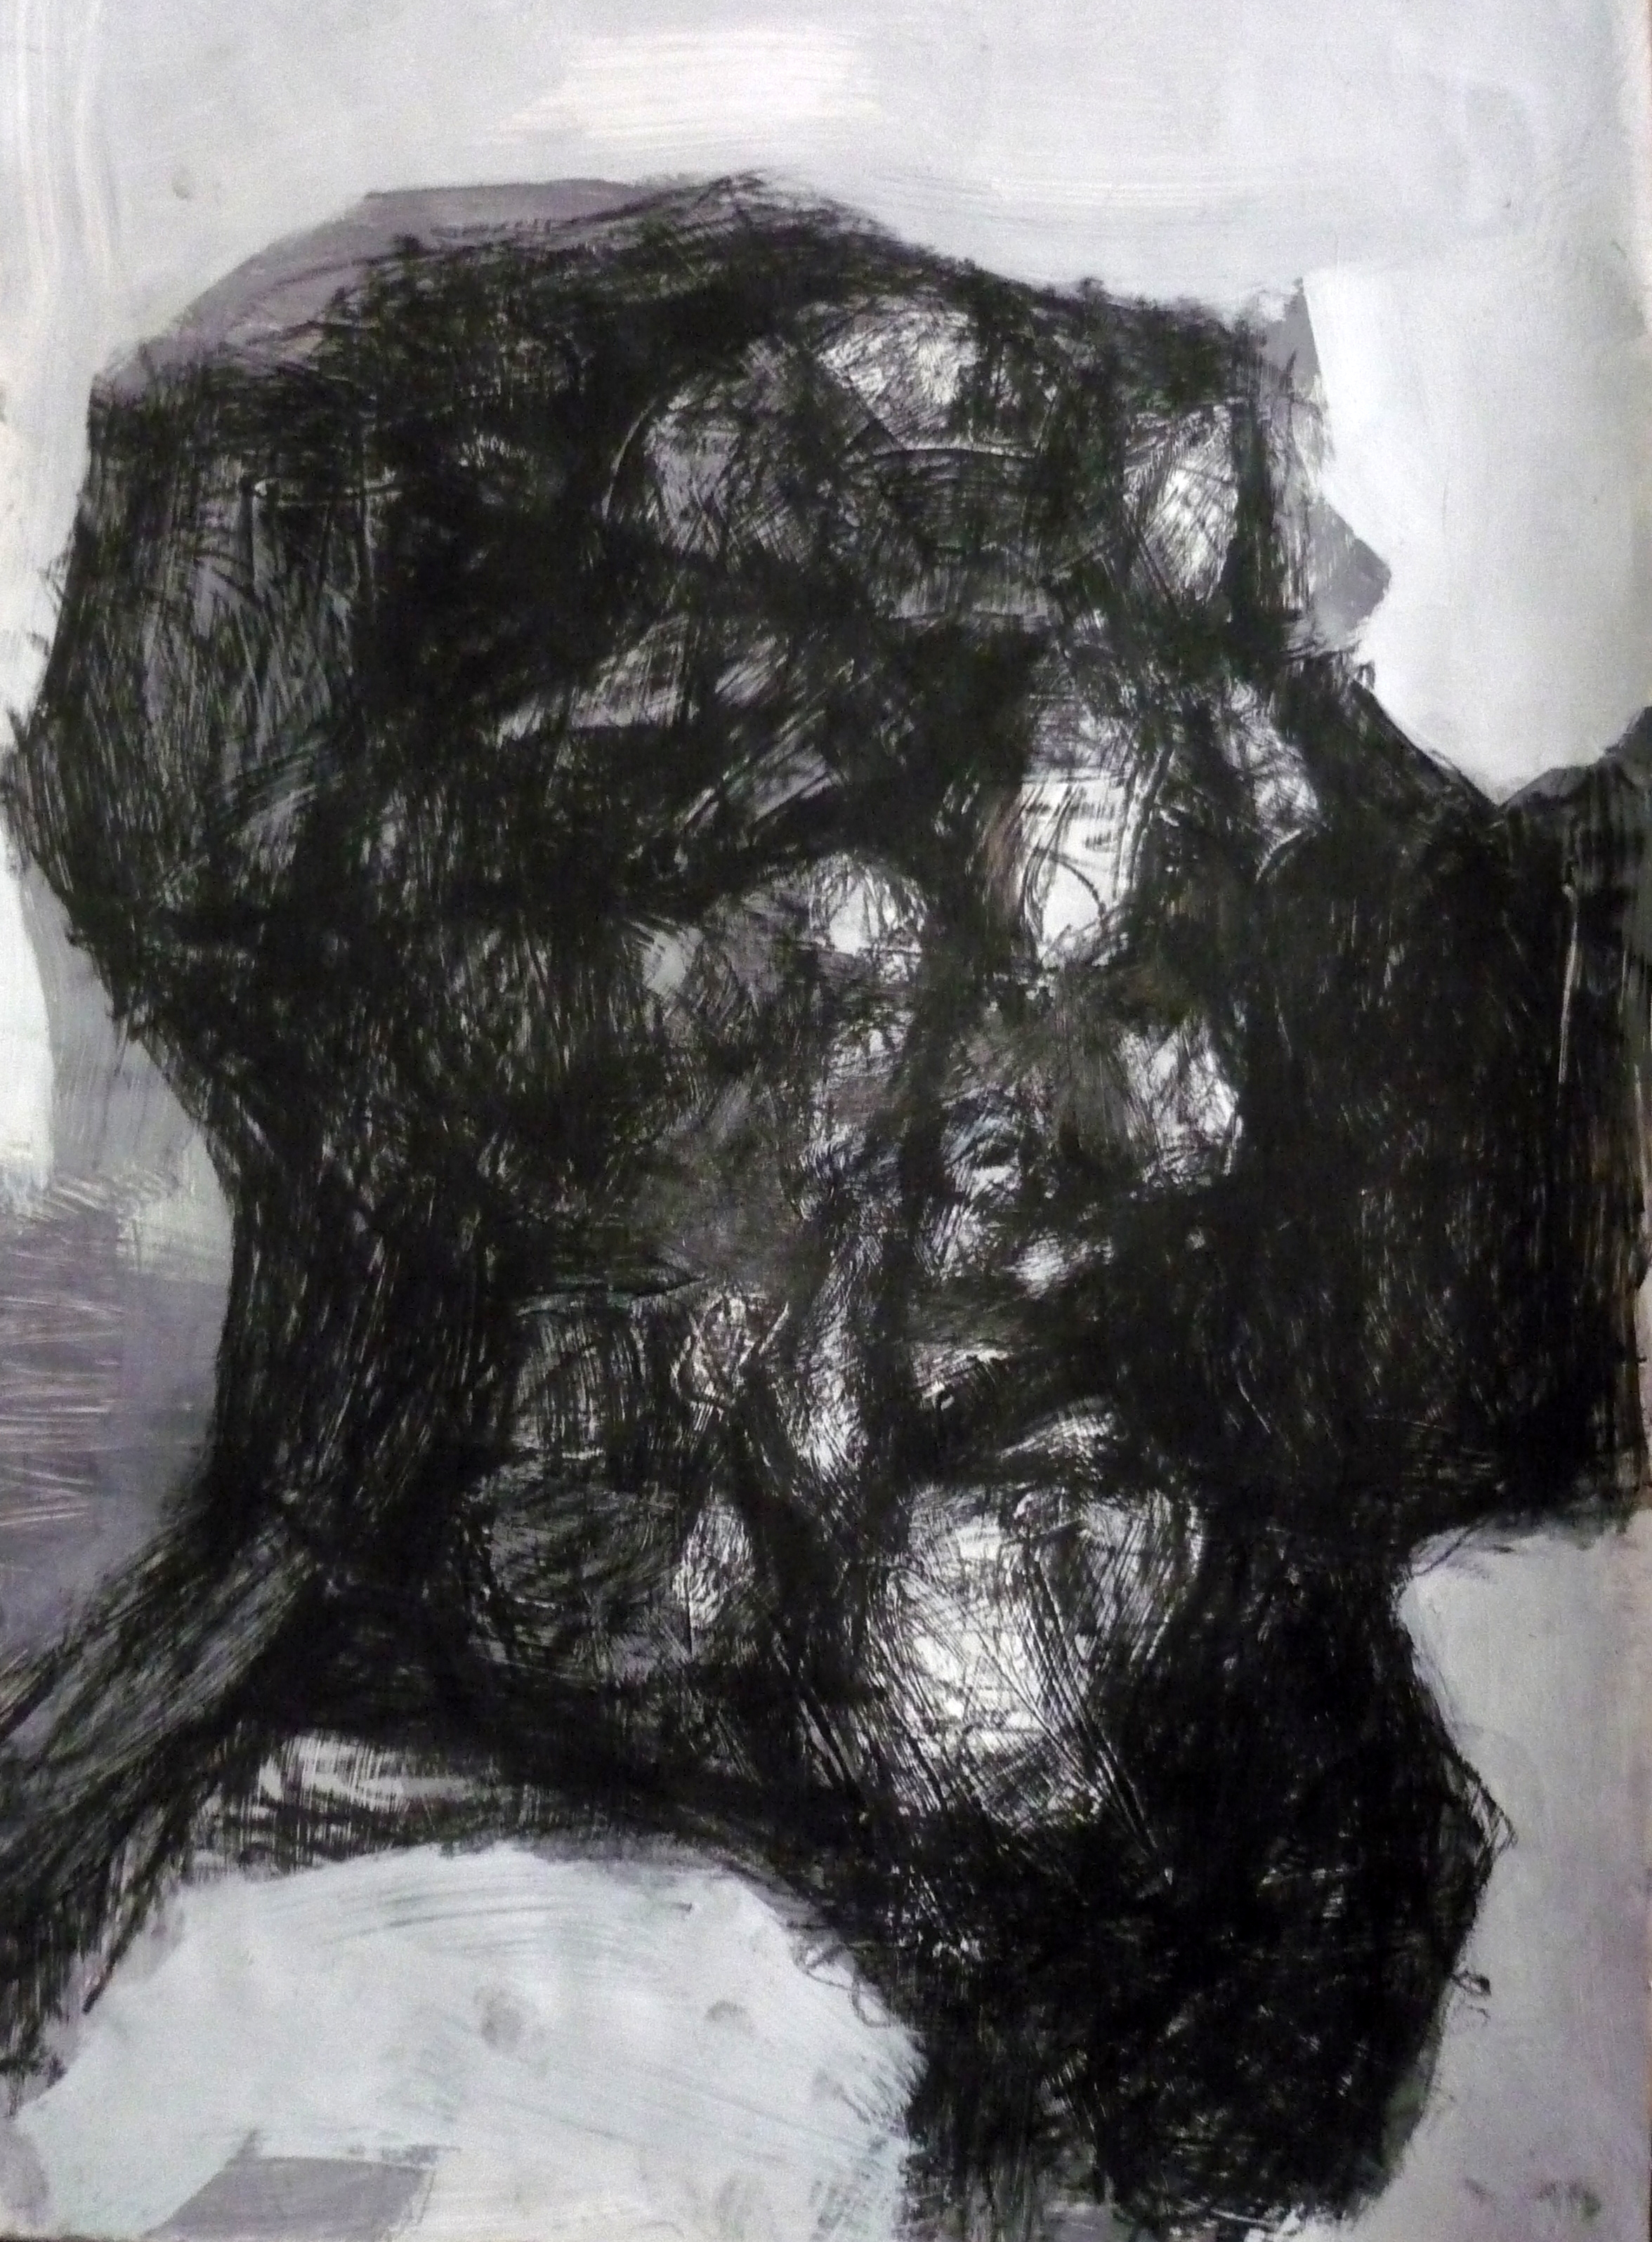 profil-u-profilu-50h35-tempera-i-ugljen-na-papiru-2014